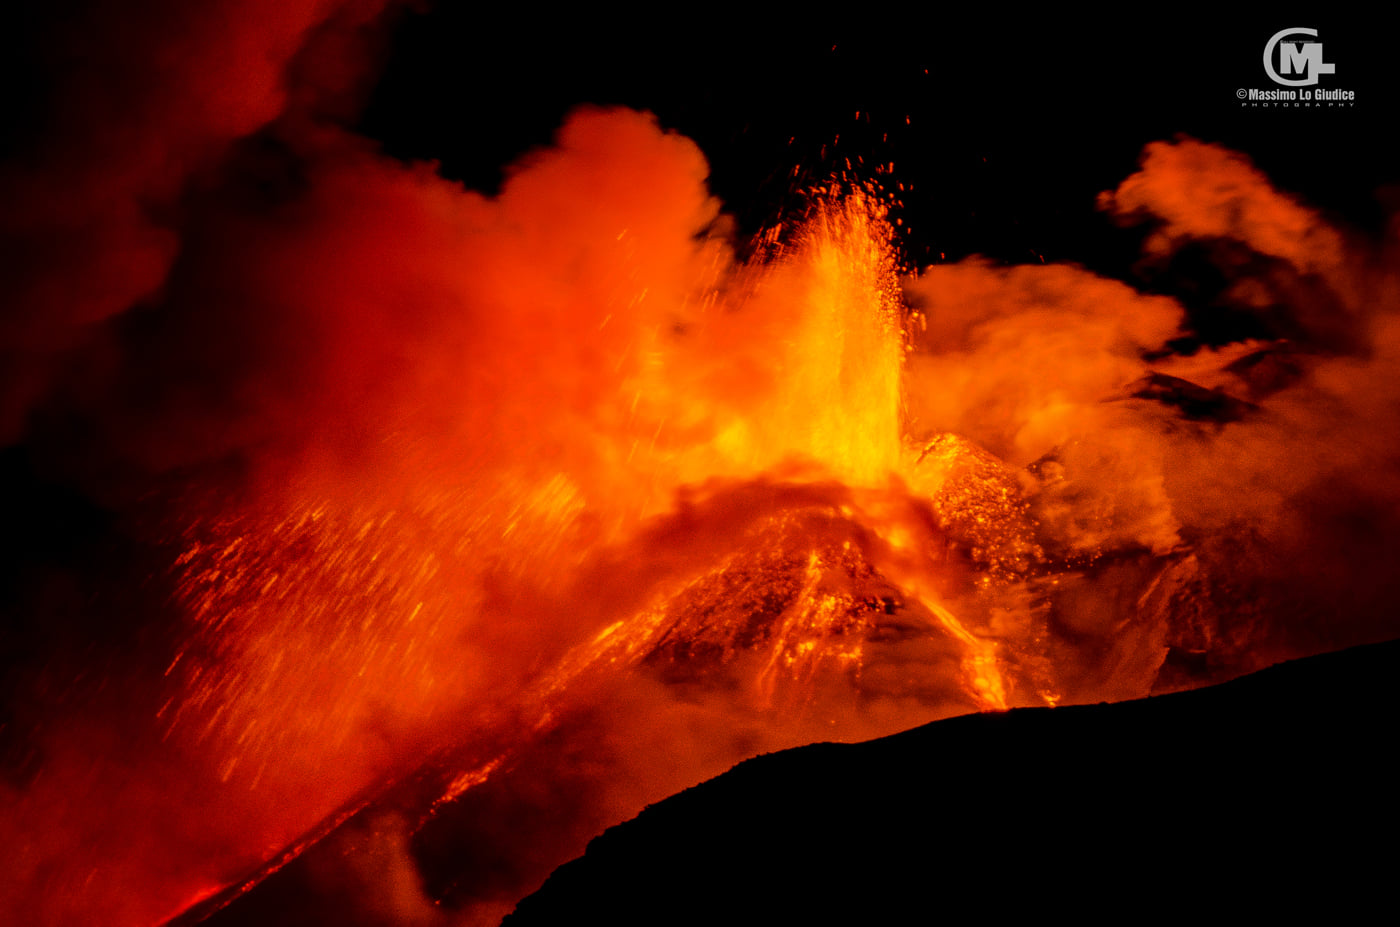 Lava fountain from Etna's New SE crater last night (image: Massimo Lo Giudice / facebook)